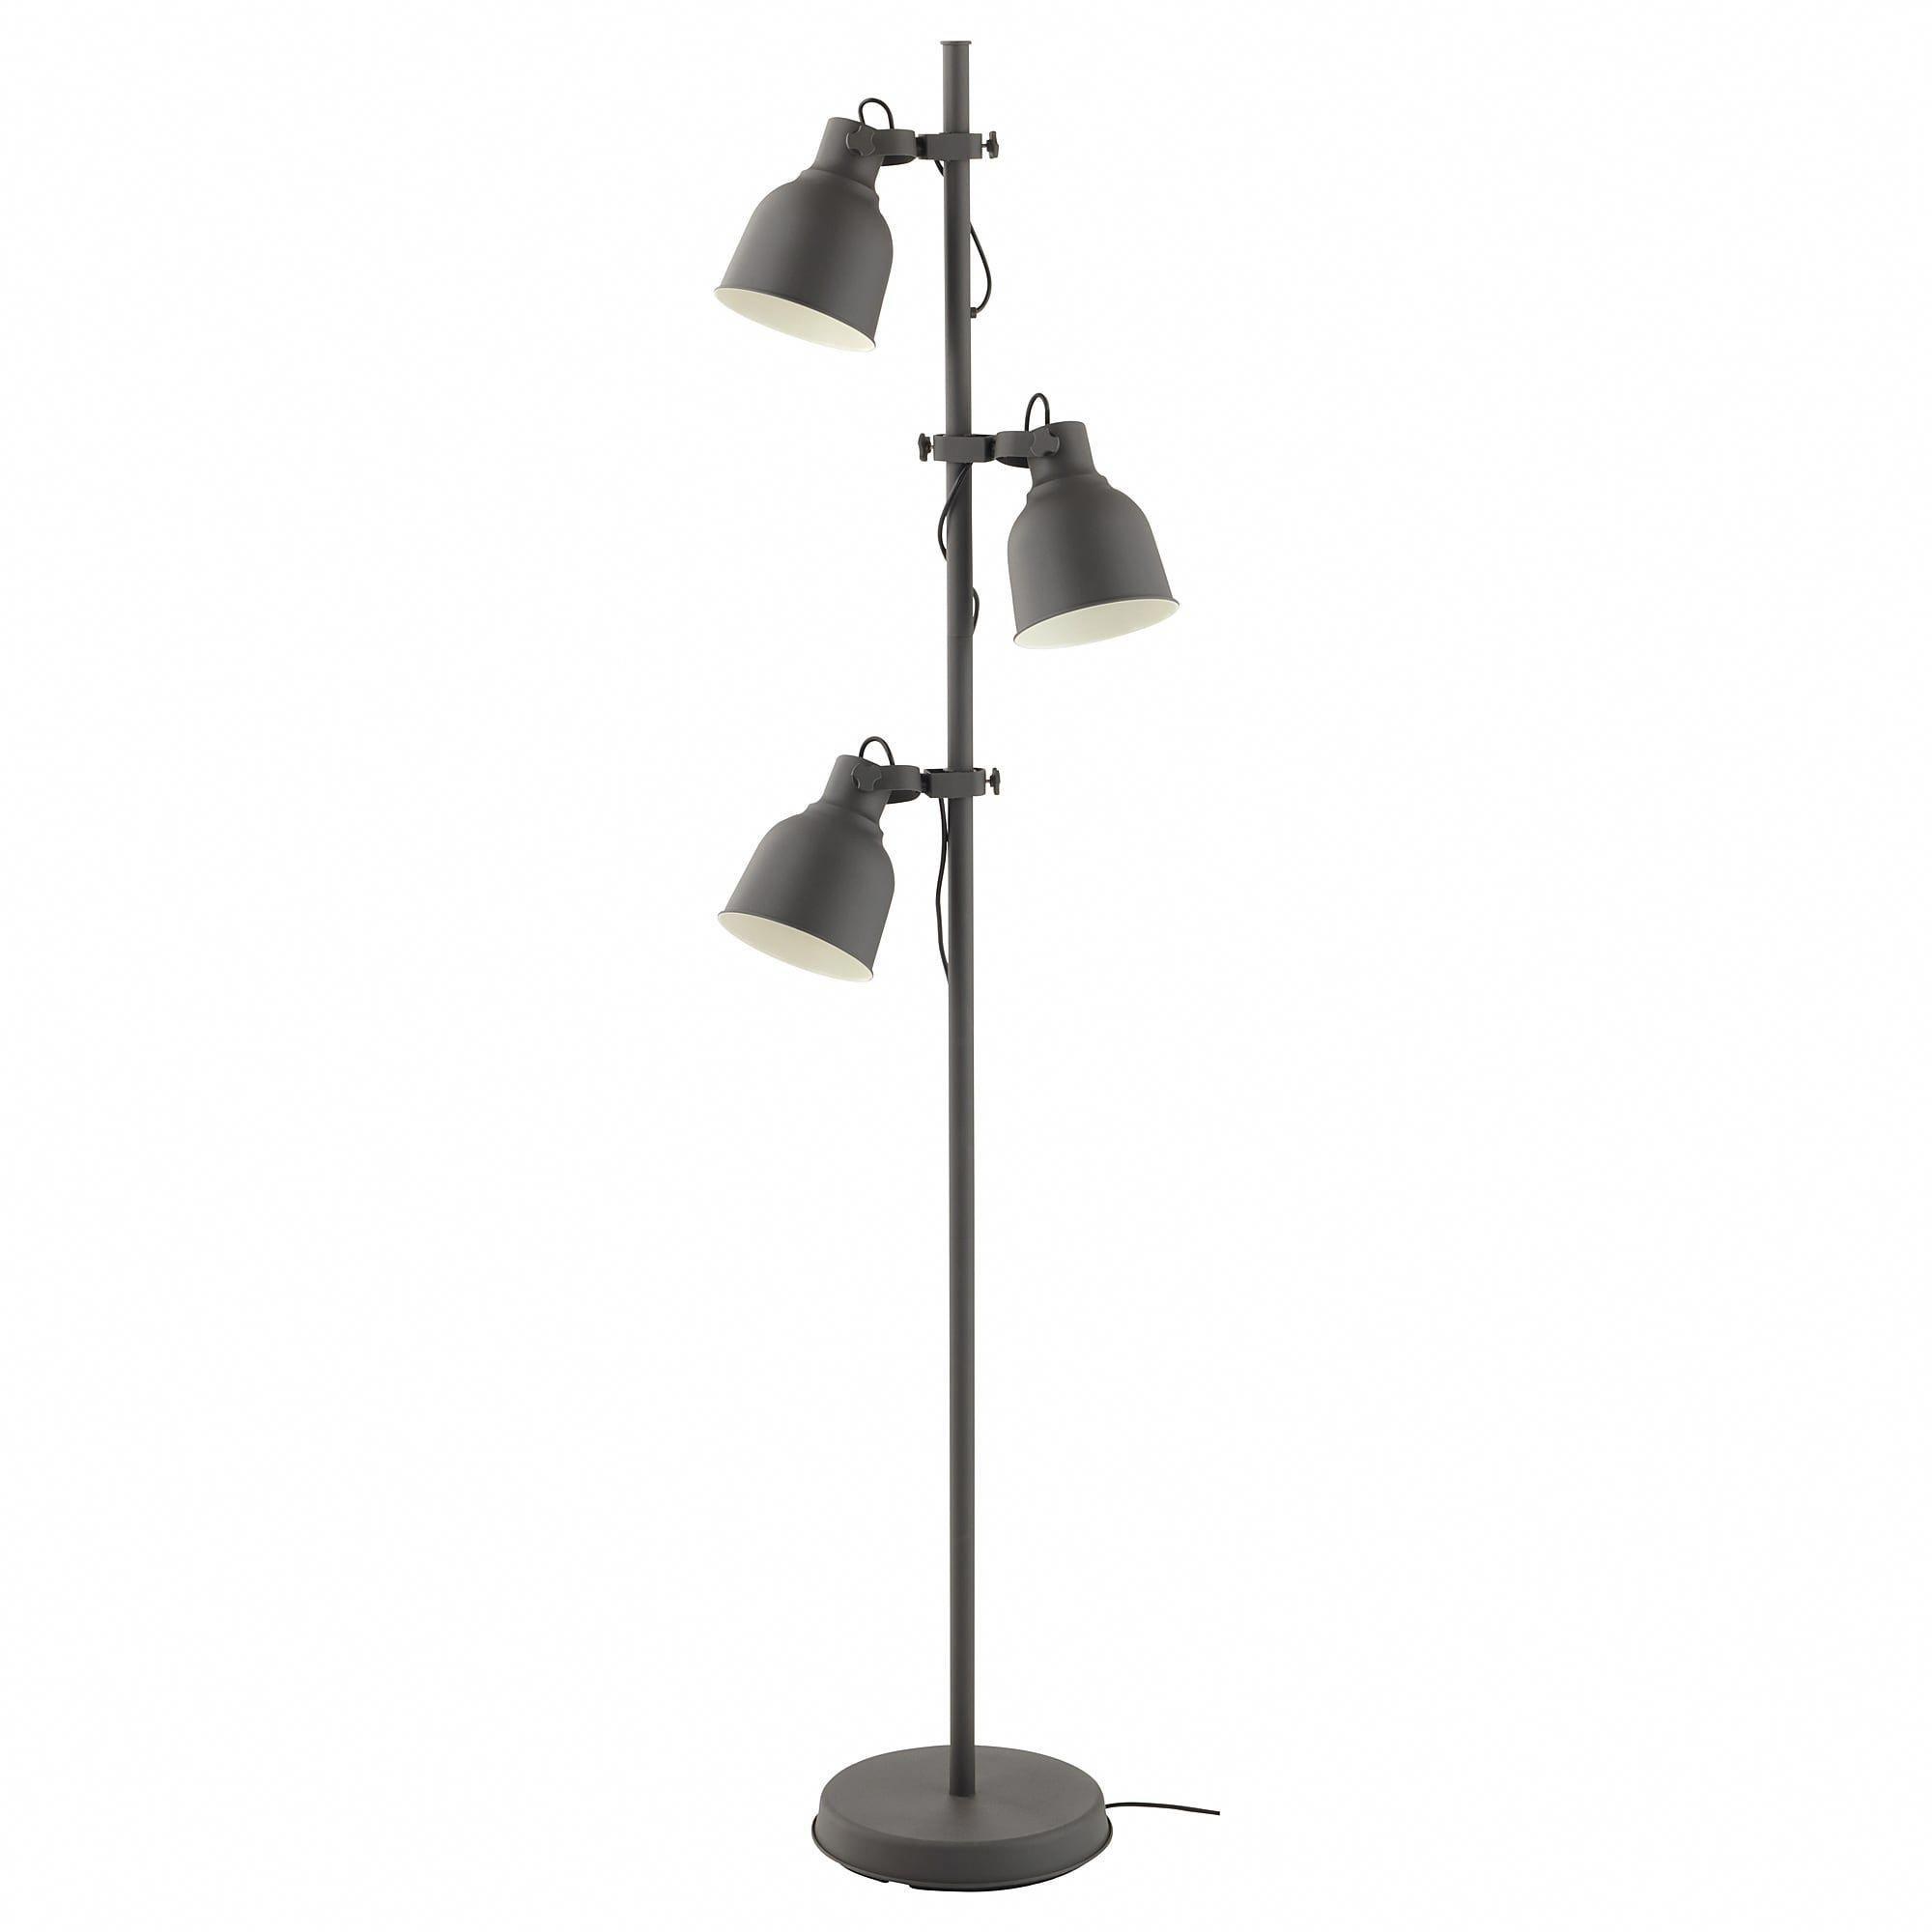 Ikea Hektar Dark Gray Floor Lamp W 3 Spots And Led Bulbs Hanginglamps Lamp Bedroom Lamps Floor Lamp